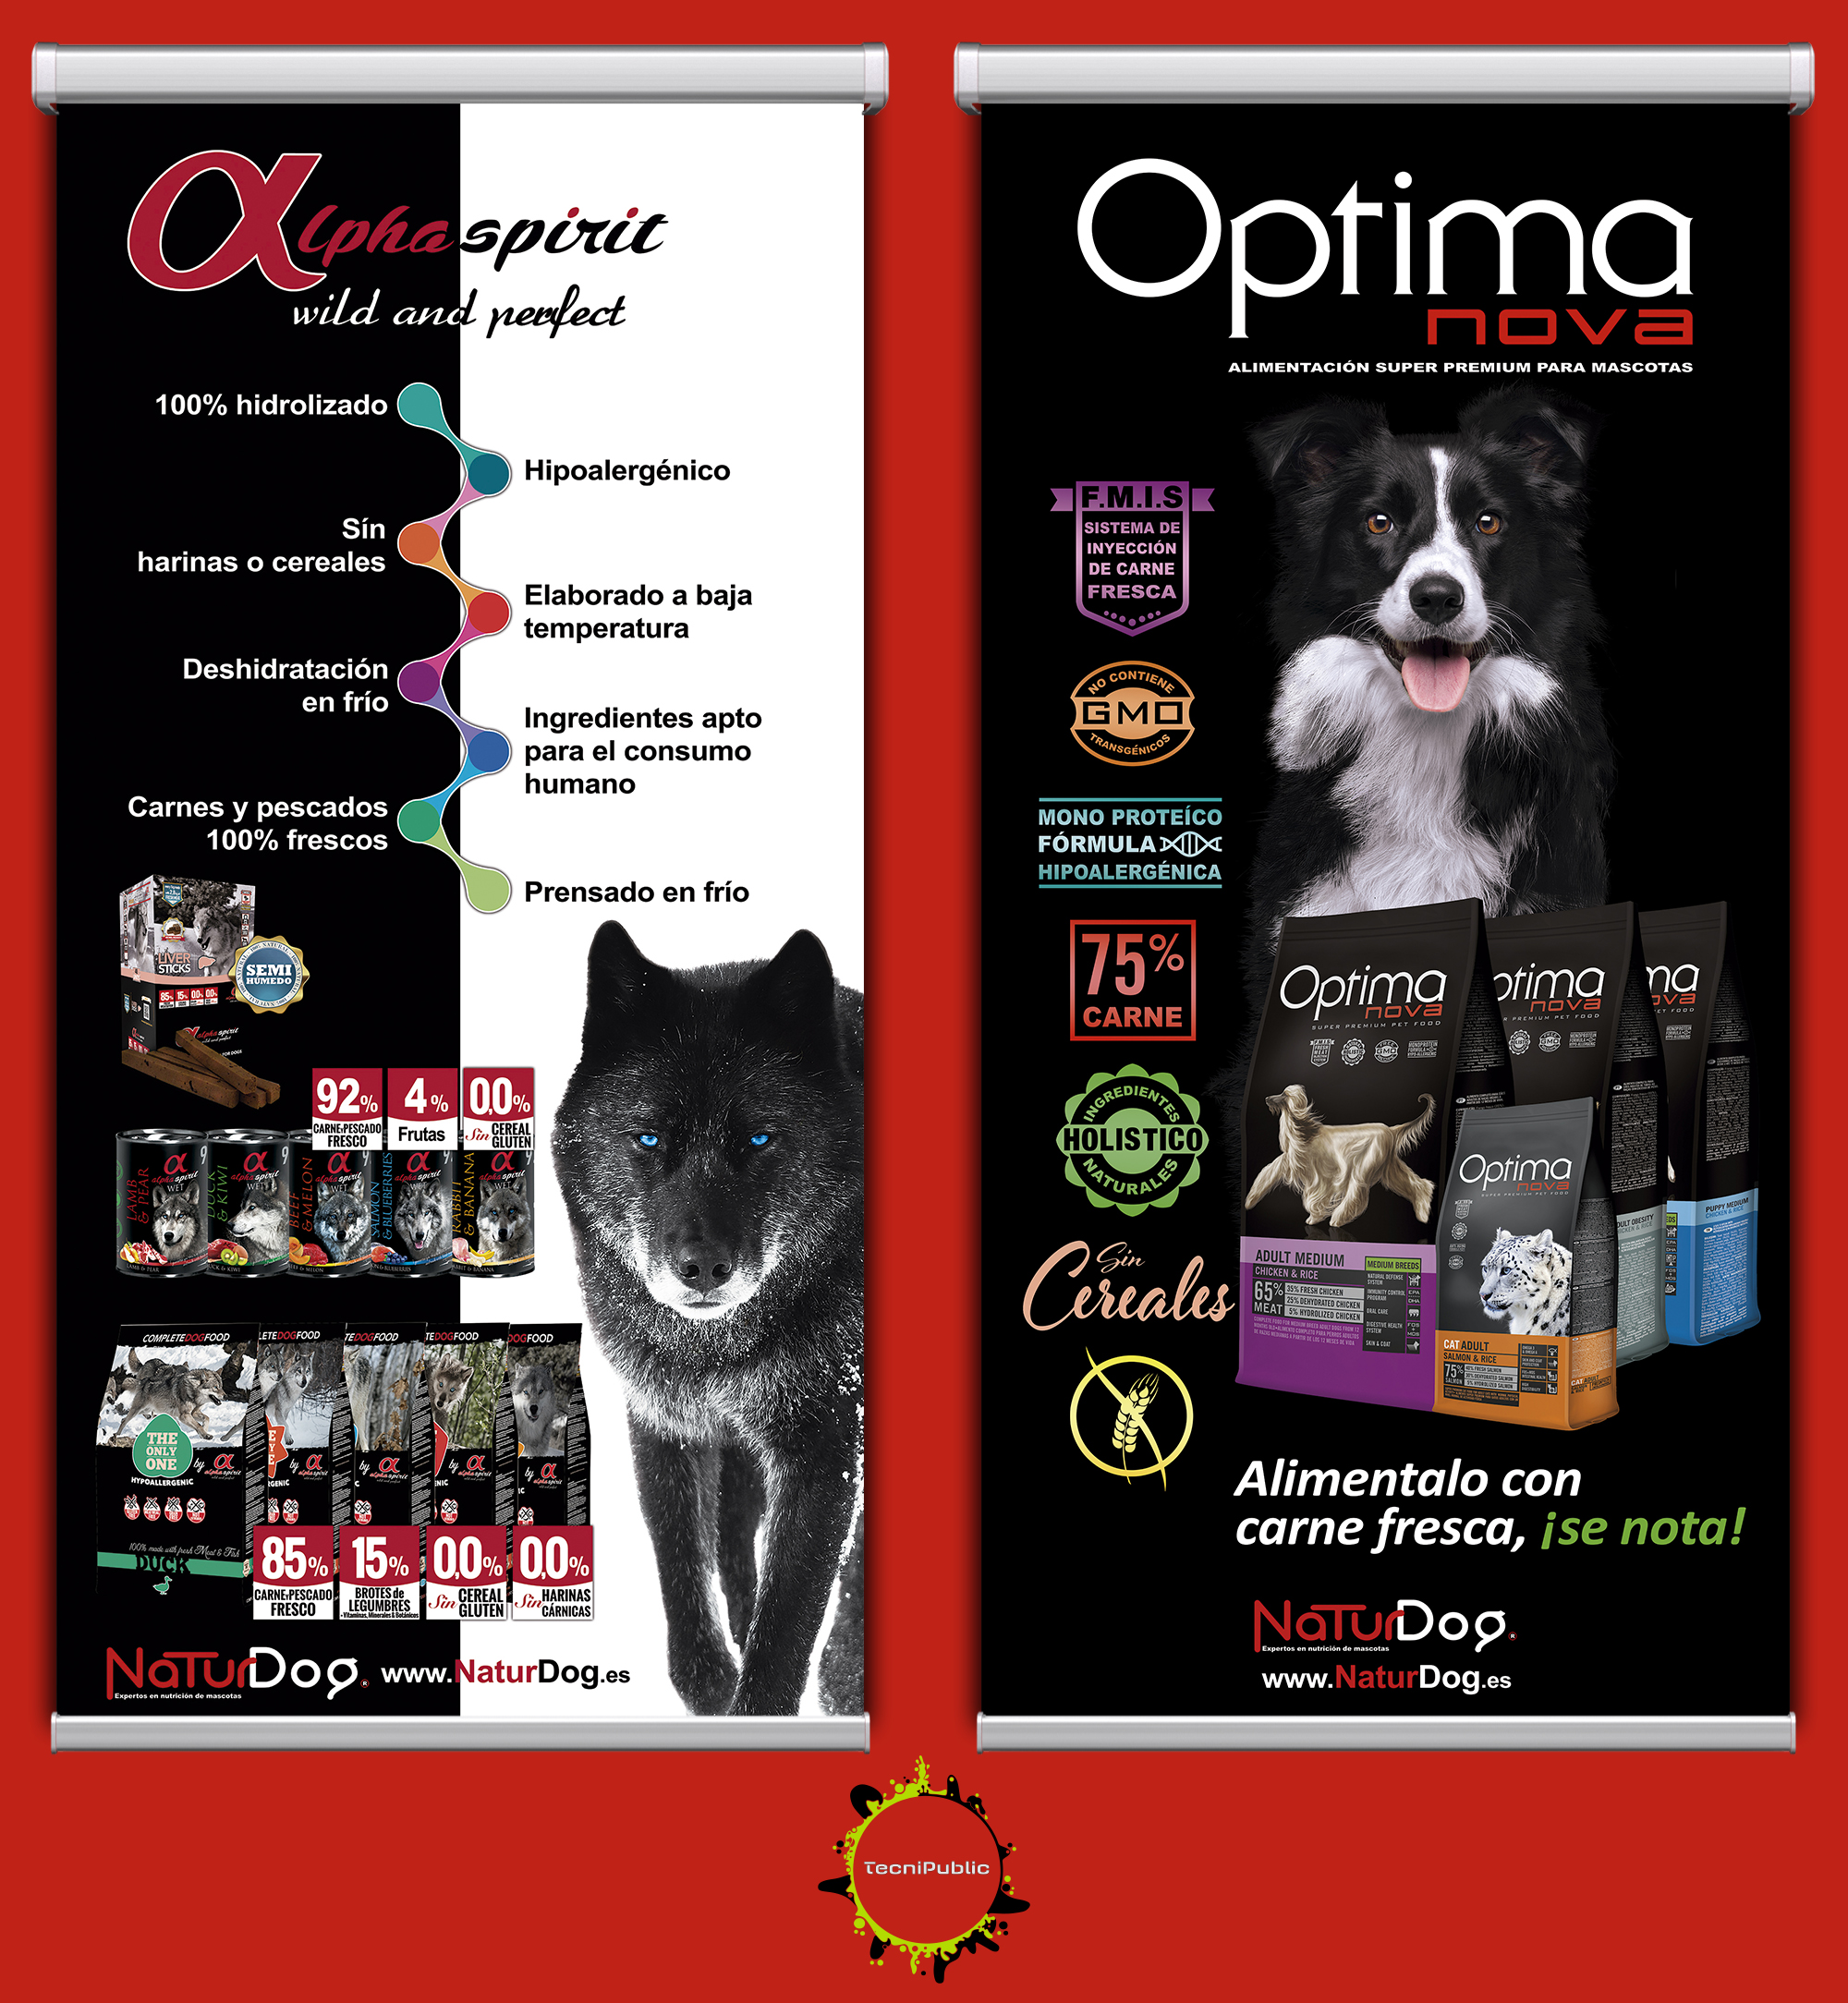 carteles Optimanova y AlphaSpirit 100x211cm